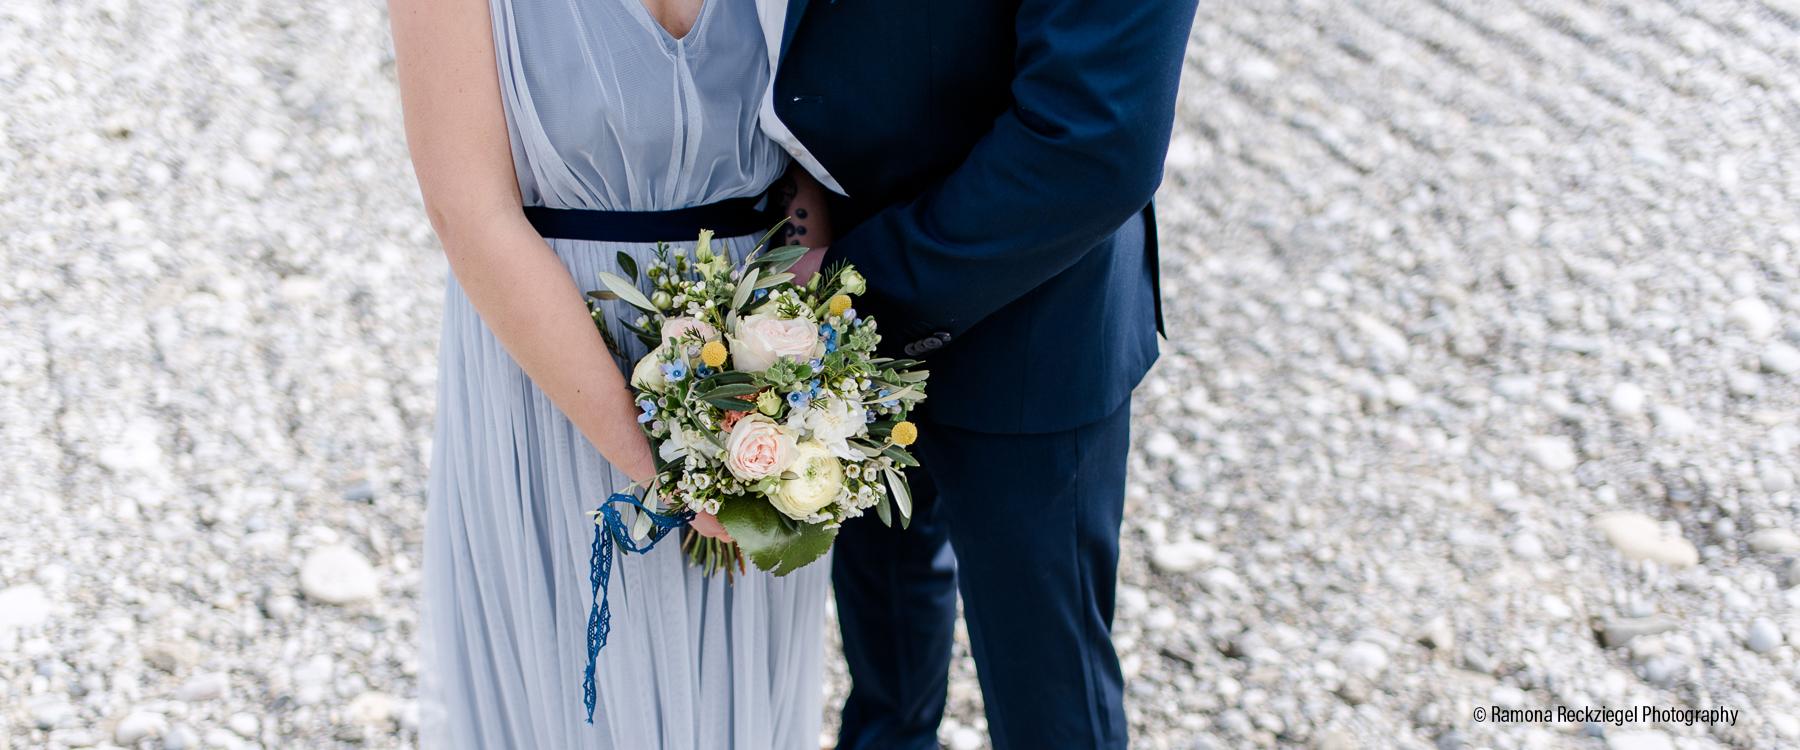 wedding-fotos-cinema-rrp-0369.jpg